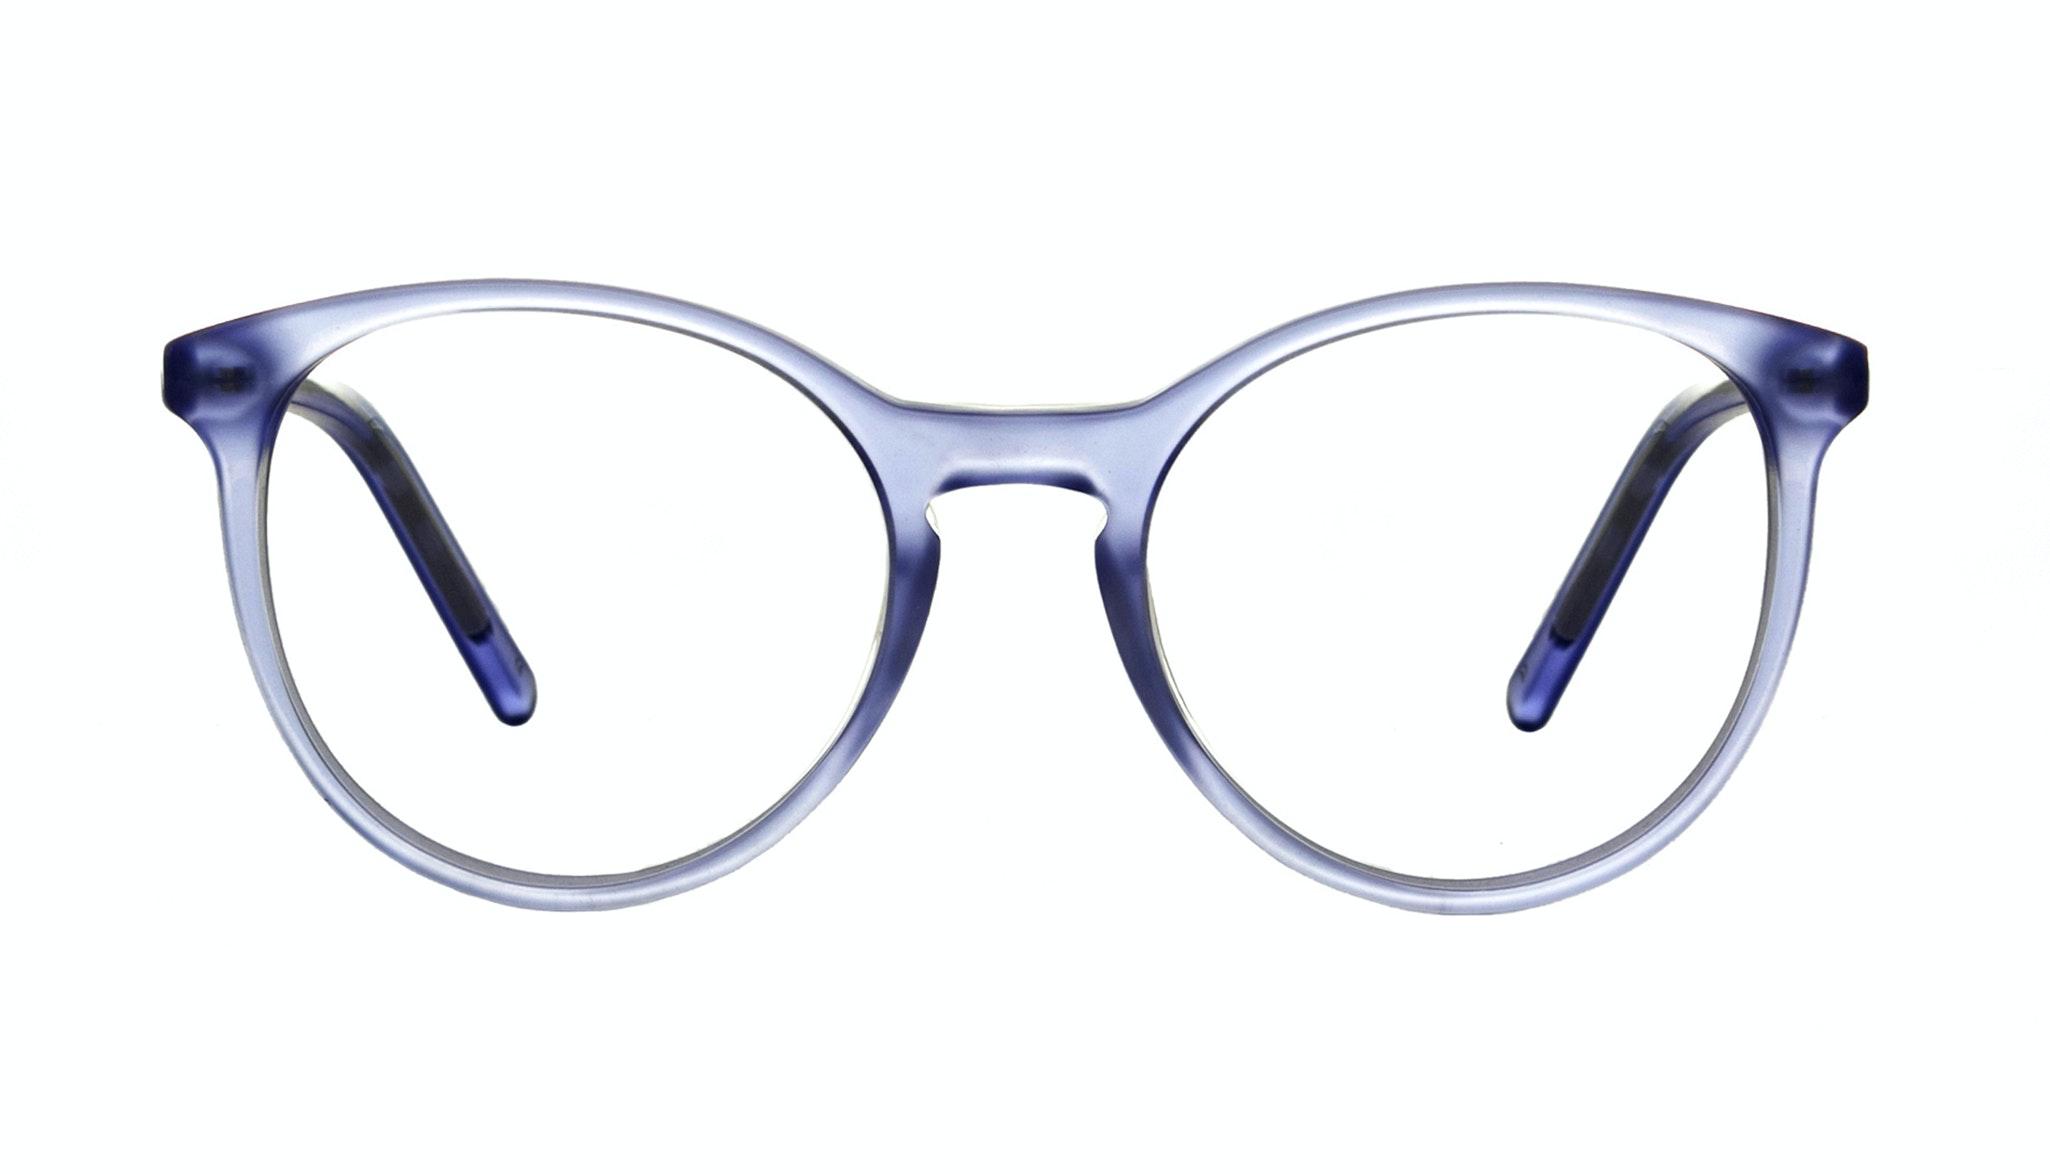 Affordable Fashion Glasses Round Eyeglasses Women Embrace Serenity